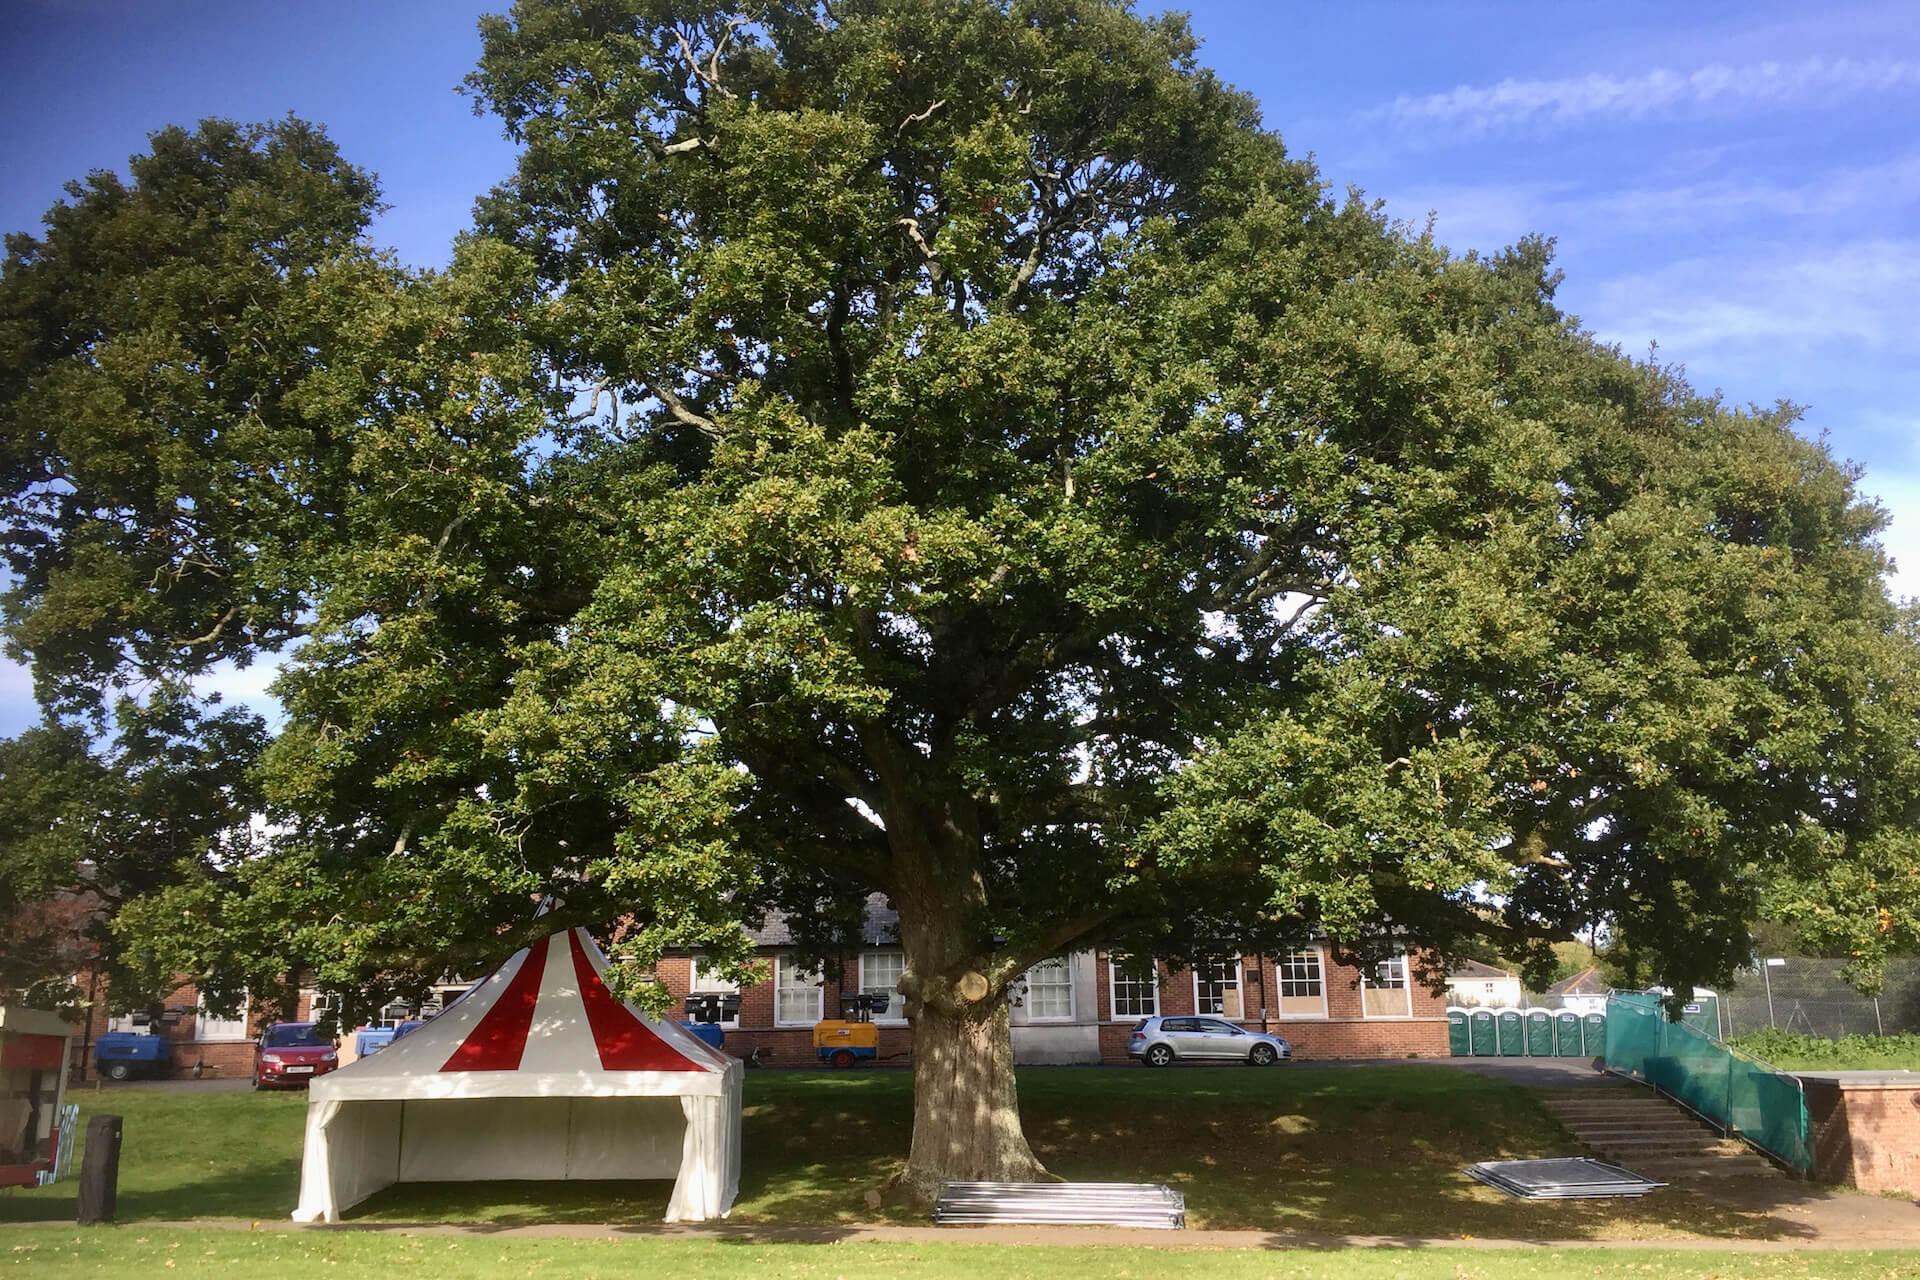 Red & white pagoda under big oak tree